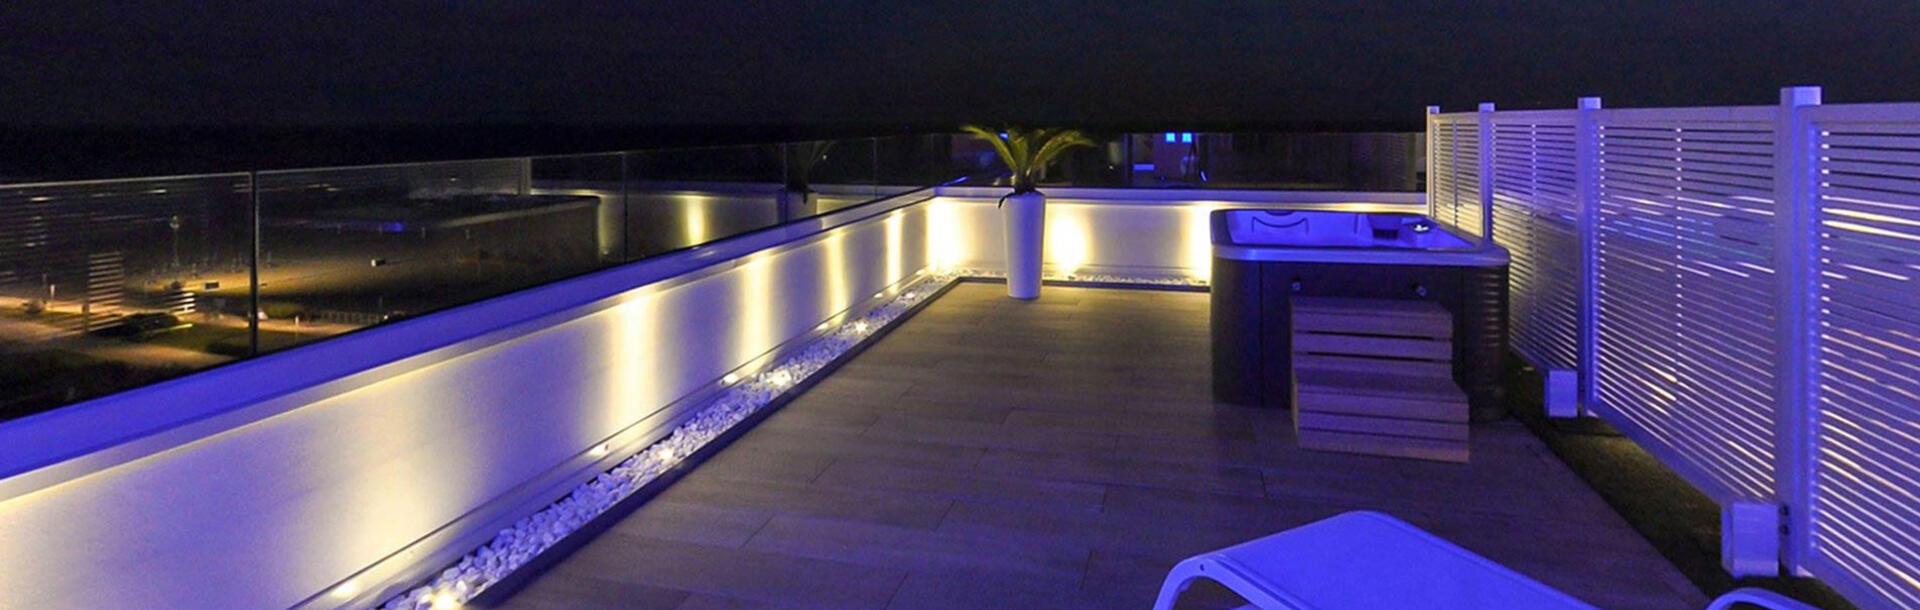 hotel-montecarlo it wellness-suite-smeraldo 013